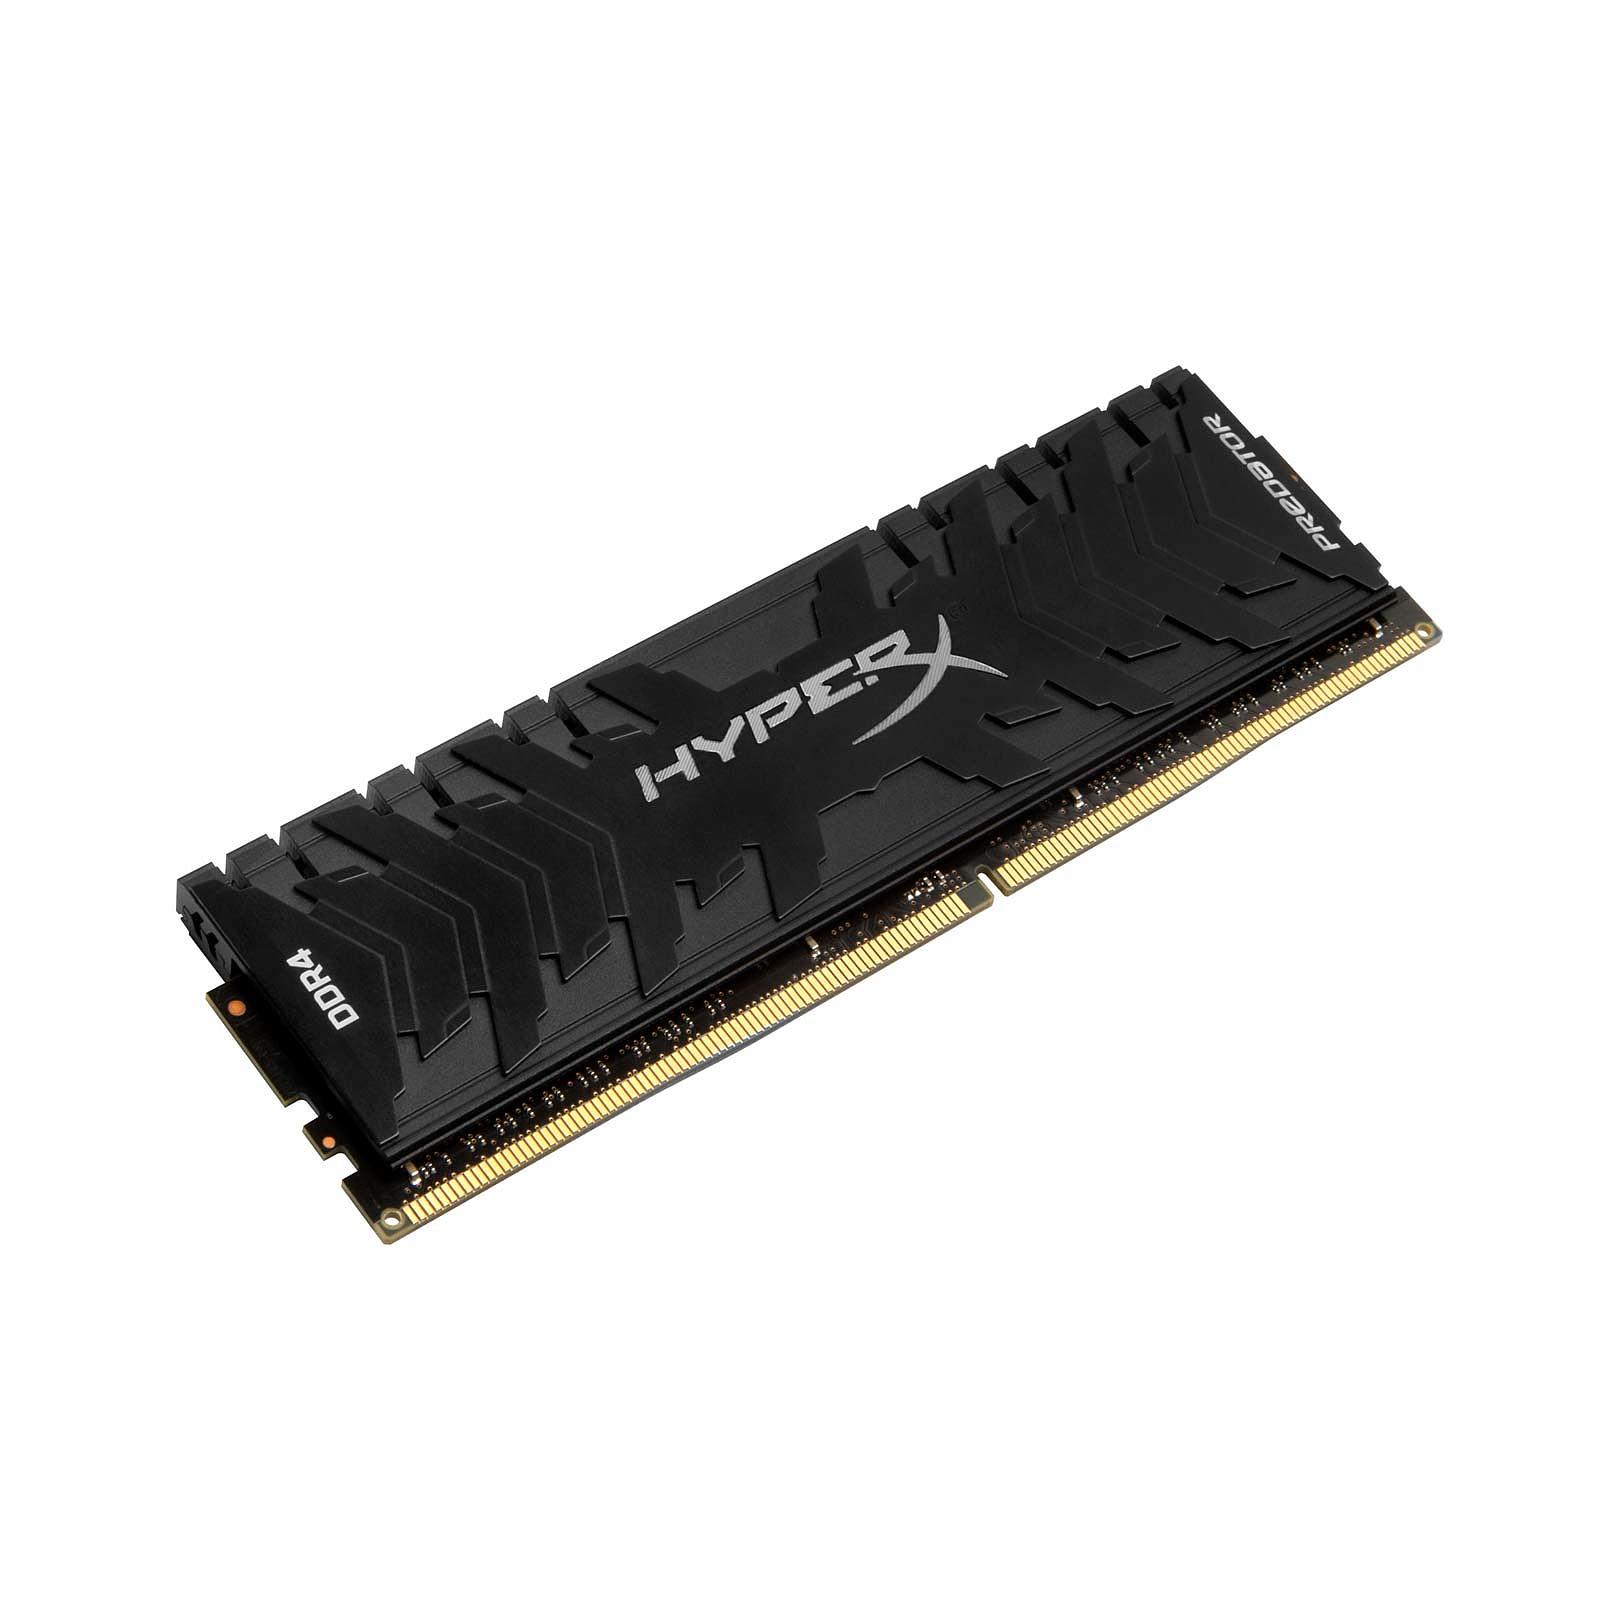 HyperX Predator Noir 8 Go DDR4 3600 MHz CL17